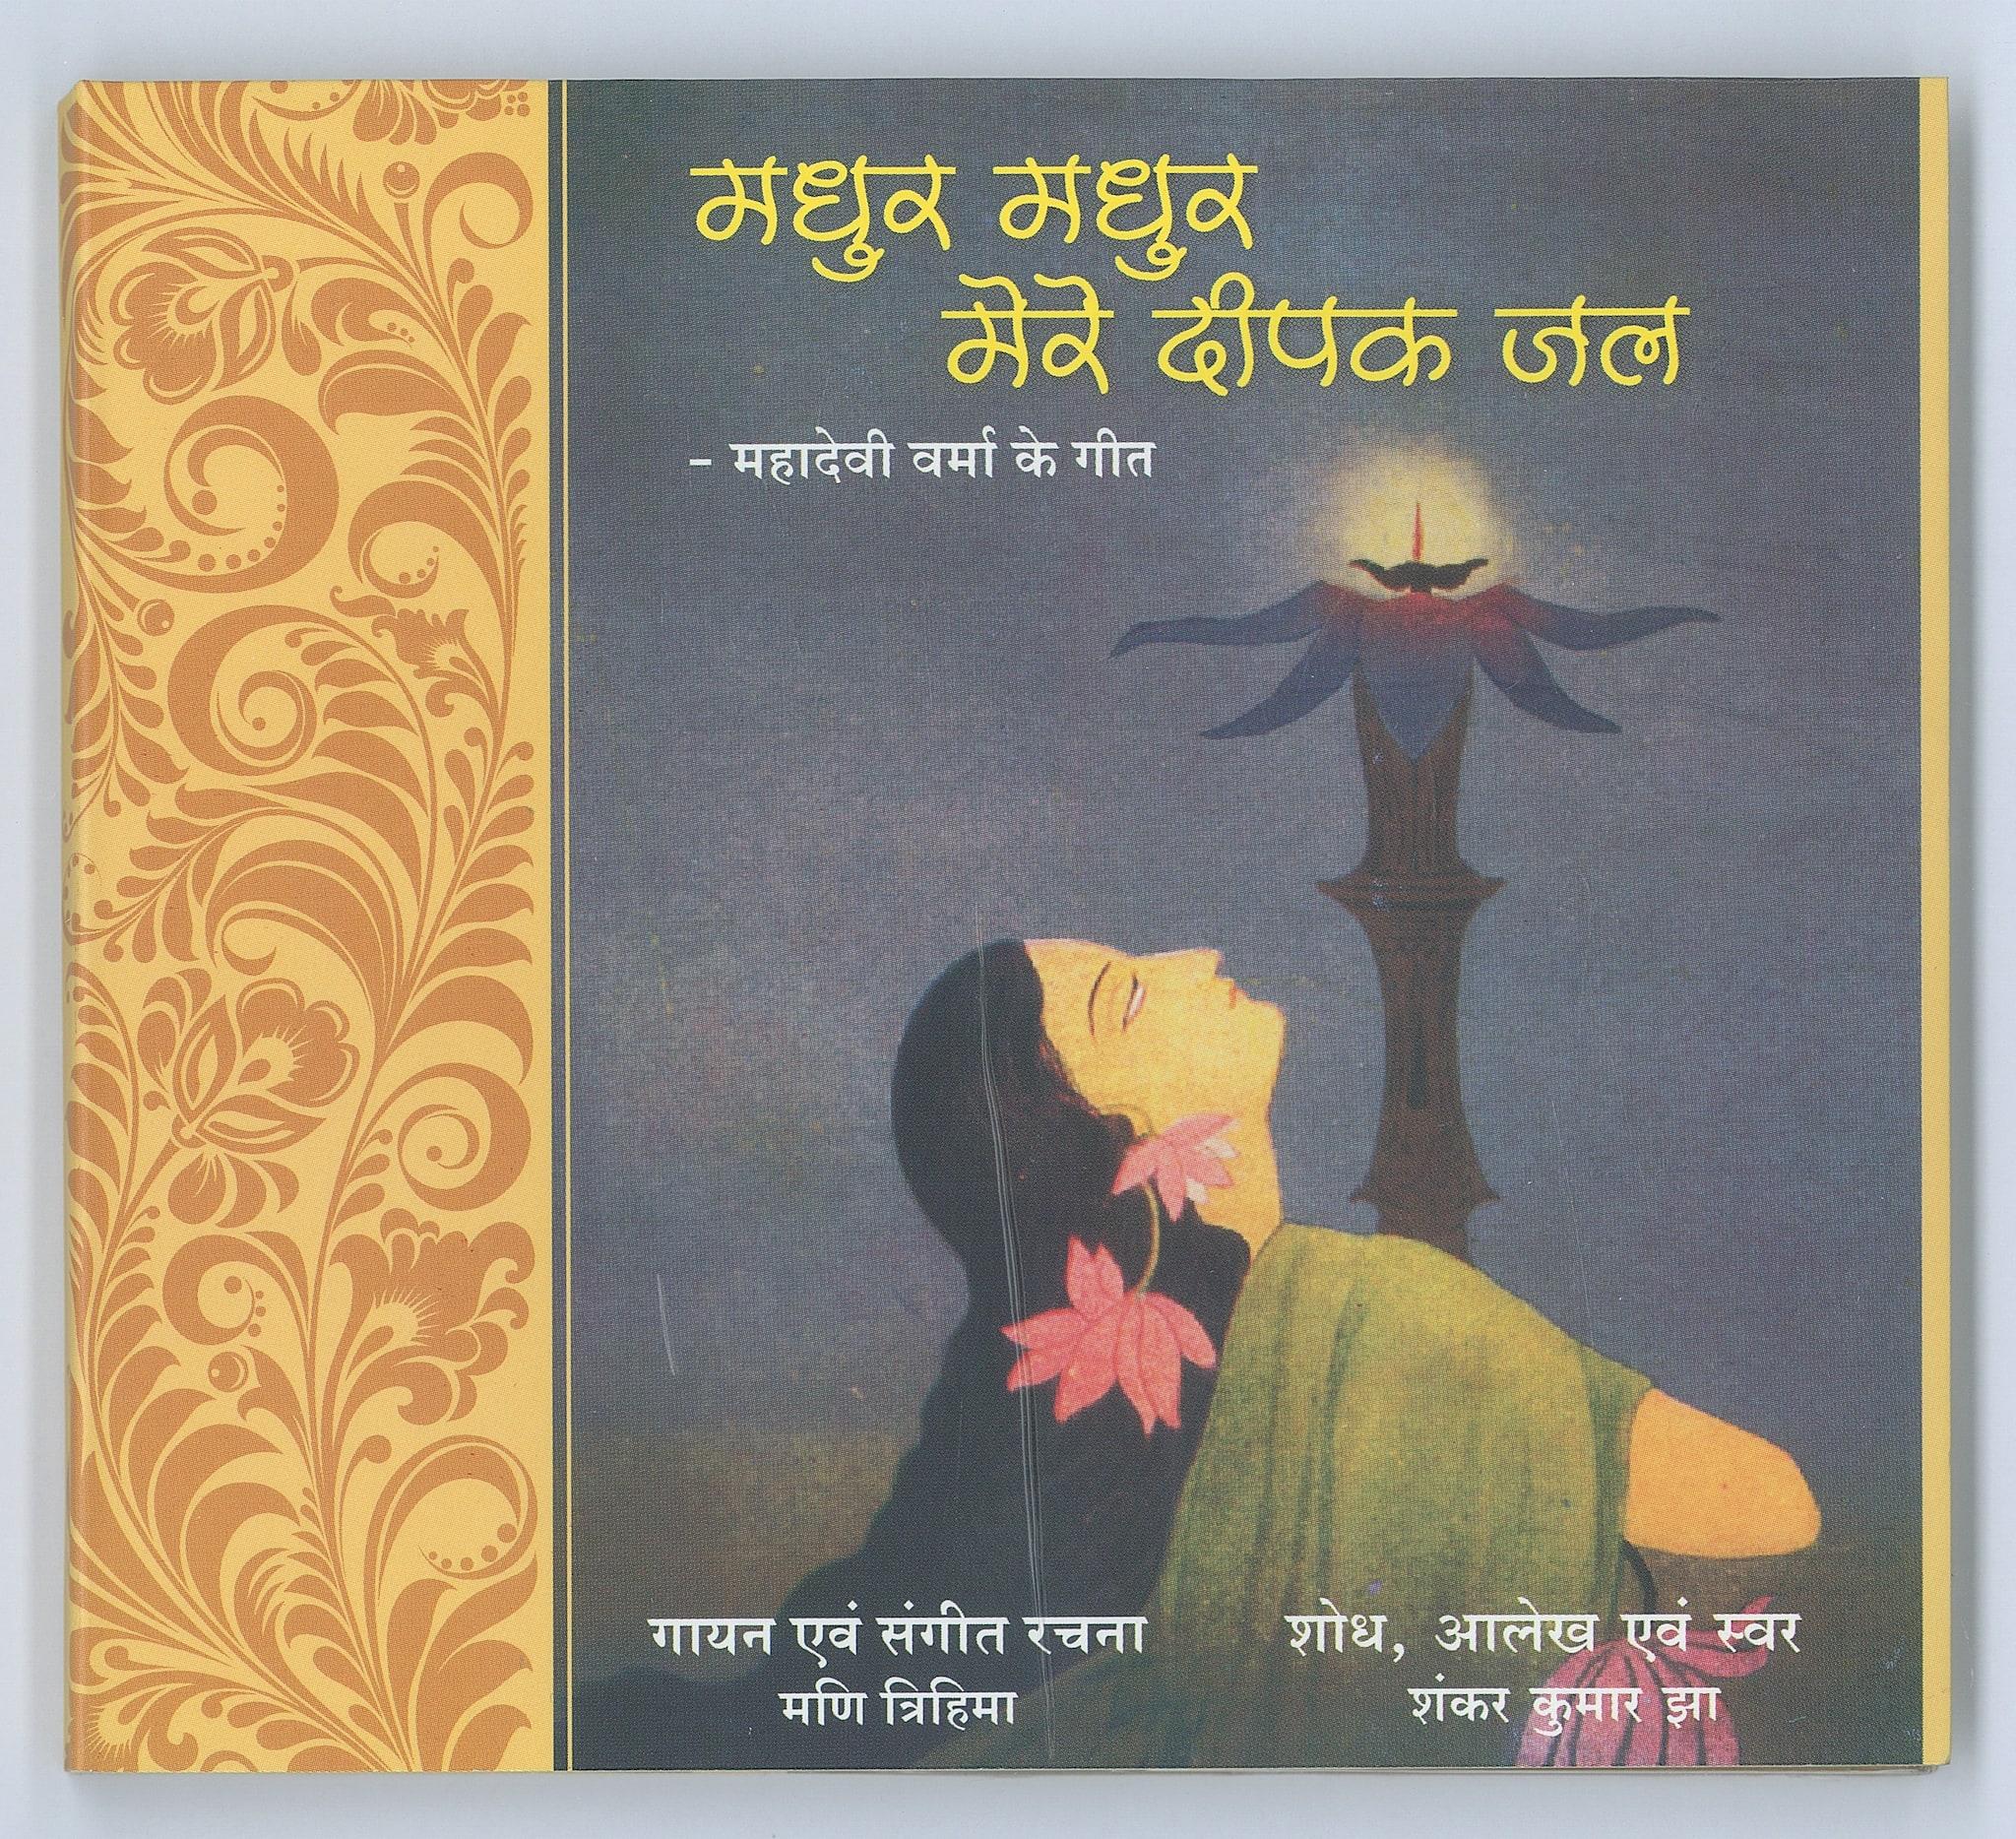 Cover of audio CD of Mahadevi Verma's selected verses.